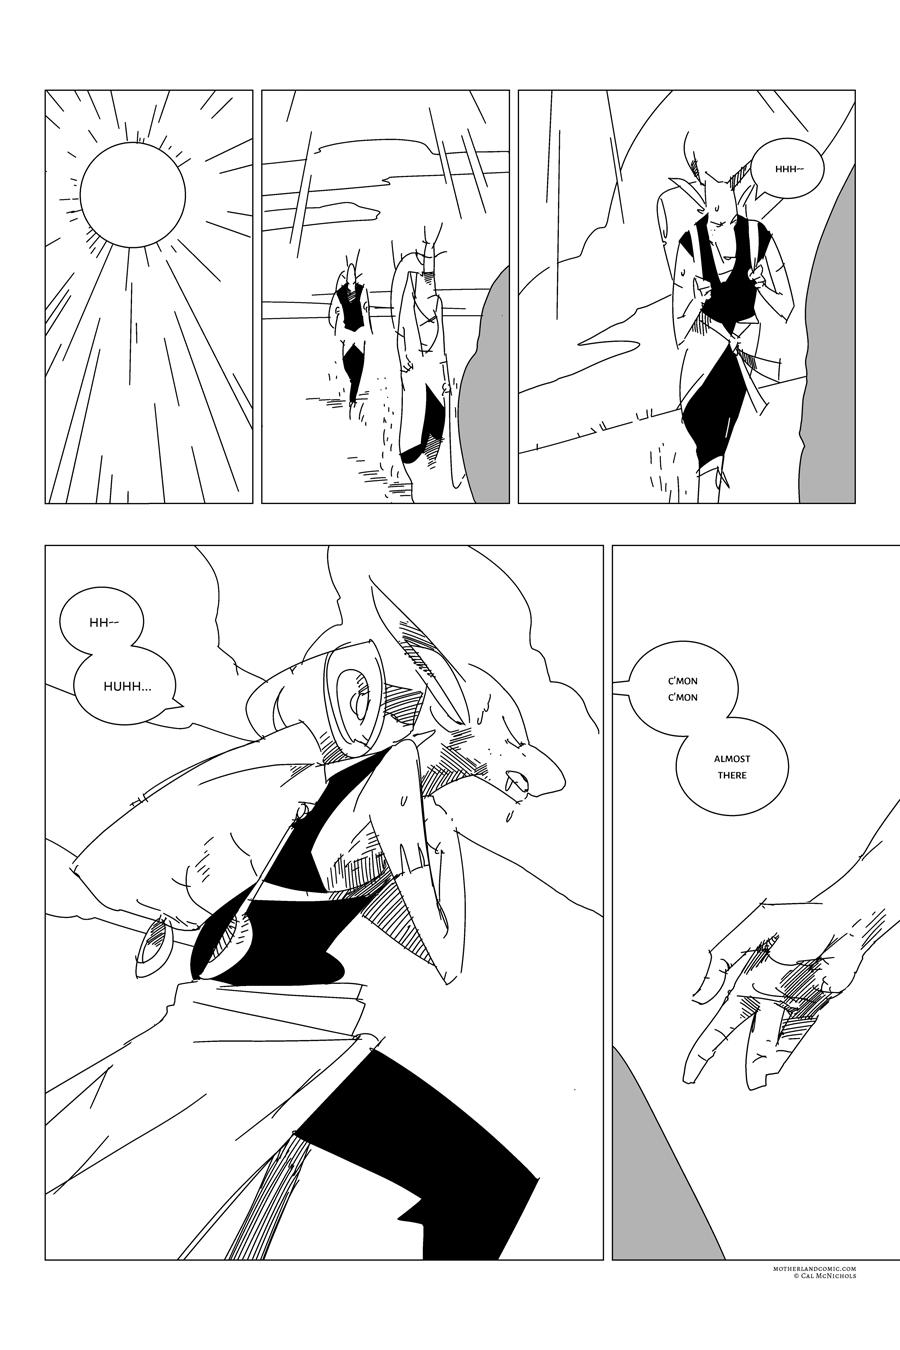 pg 93